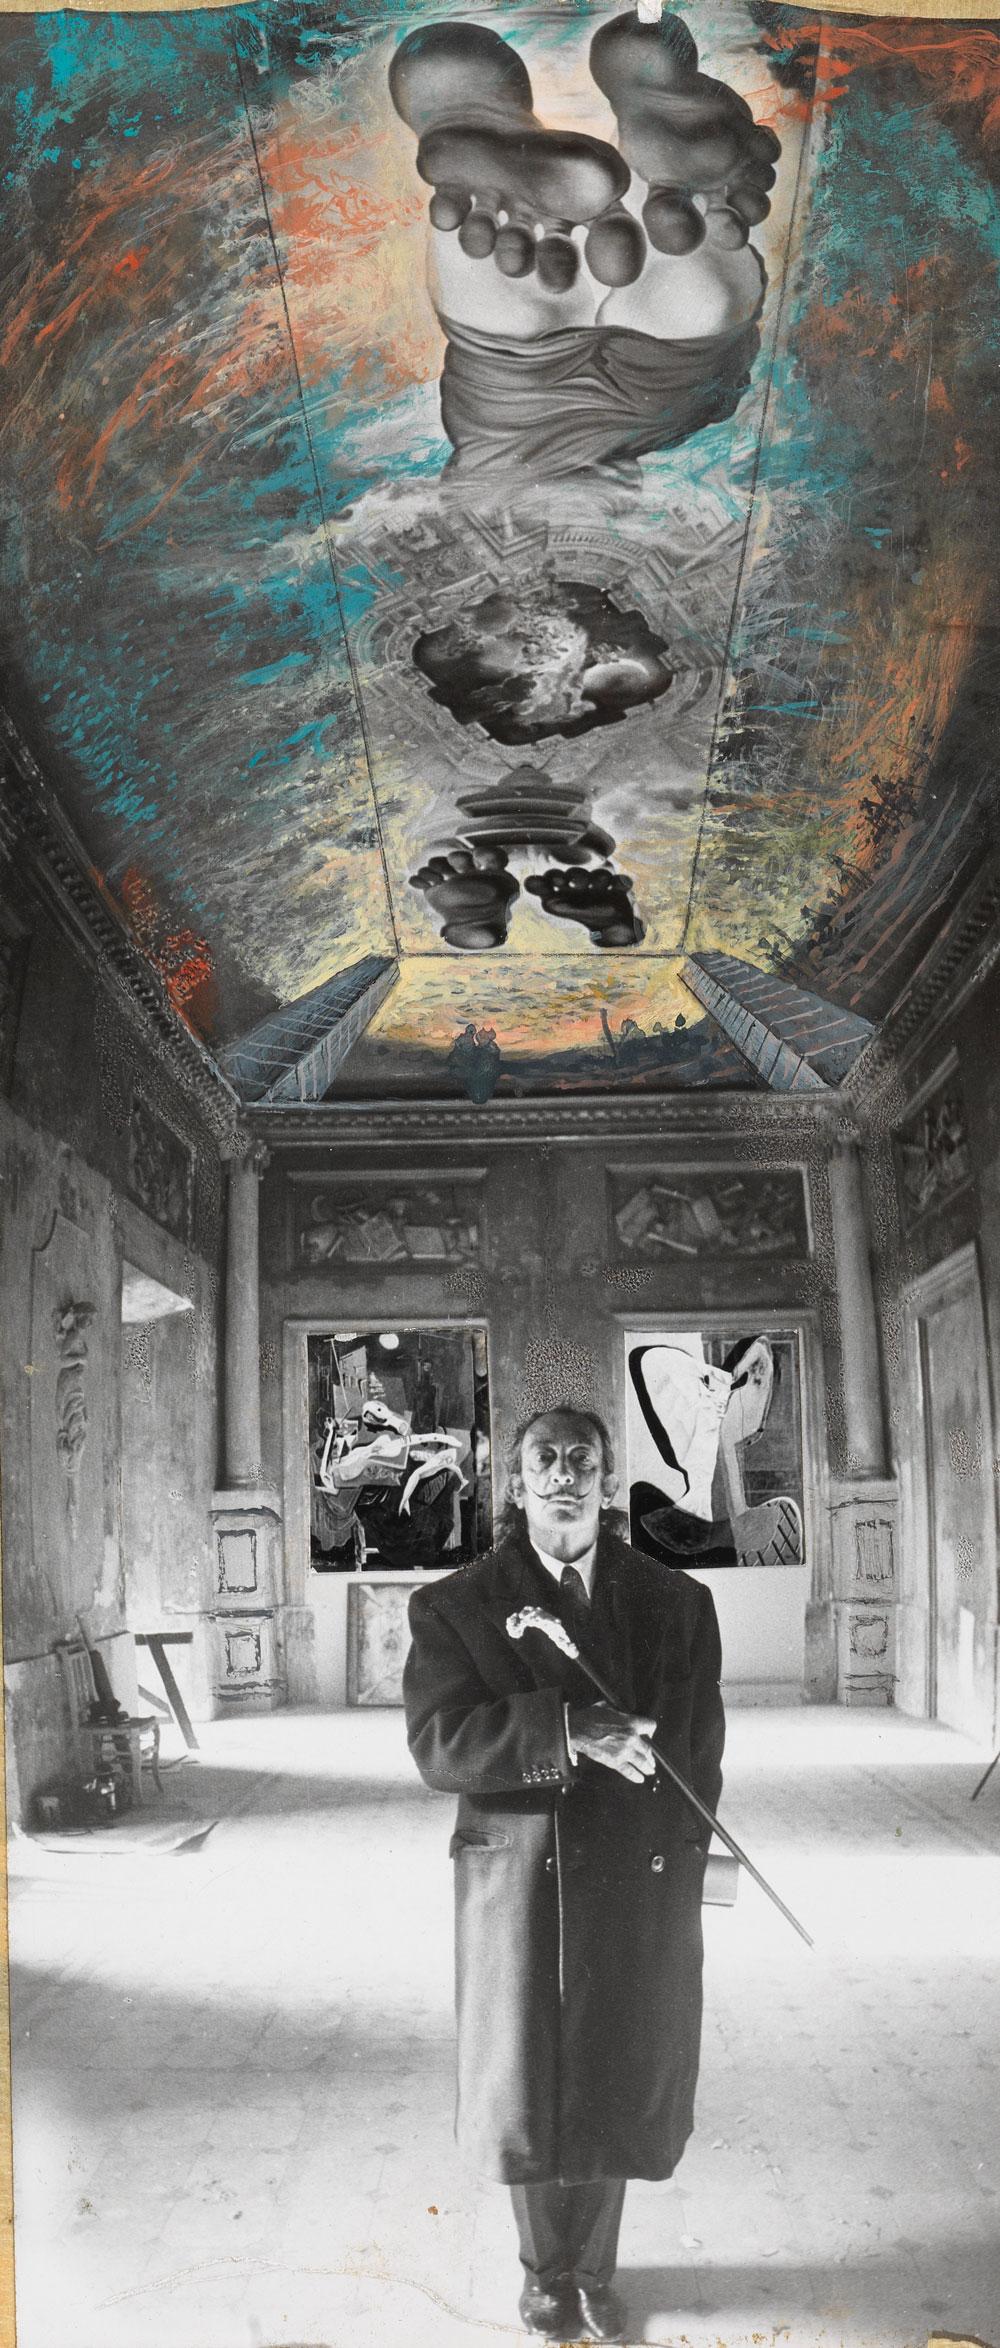 Napoli dedica una mostra a Salvador Dalí